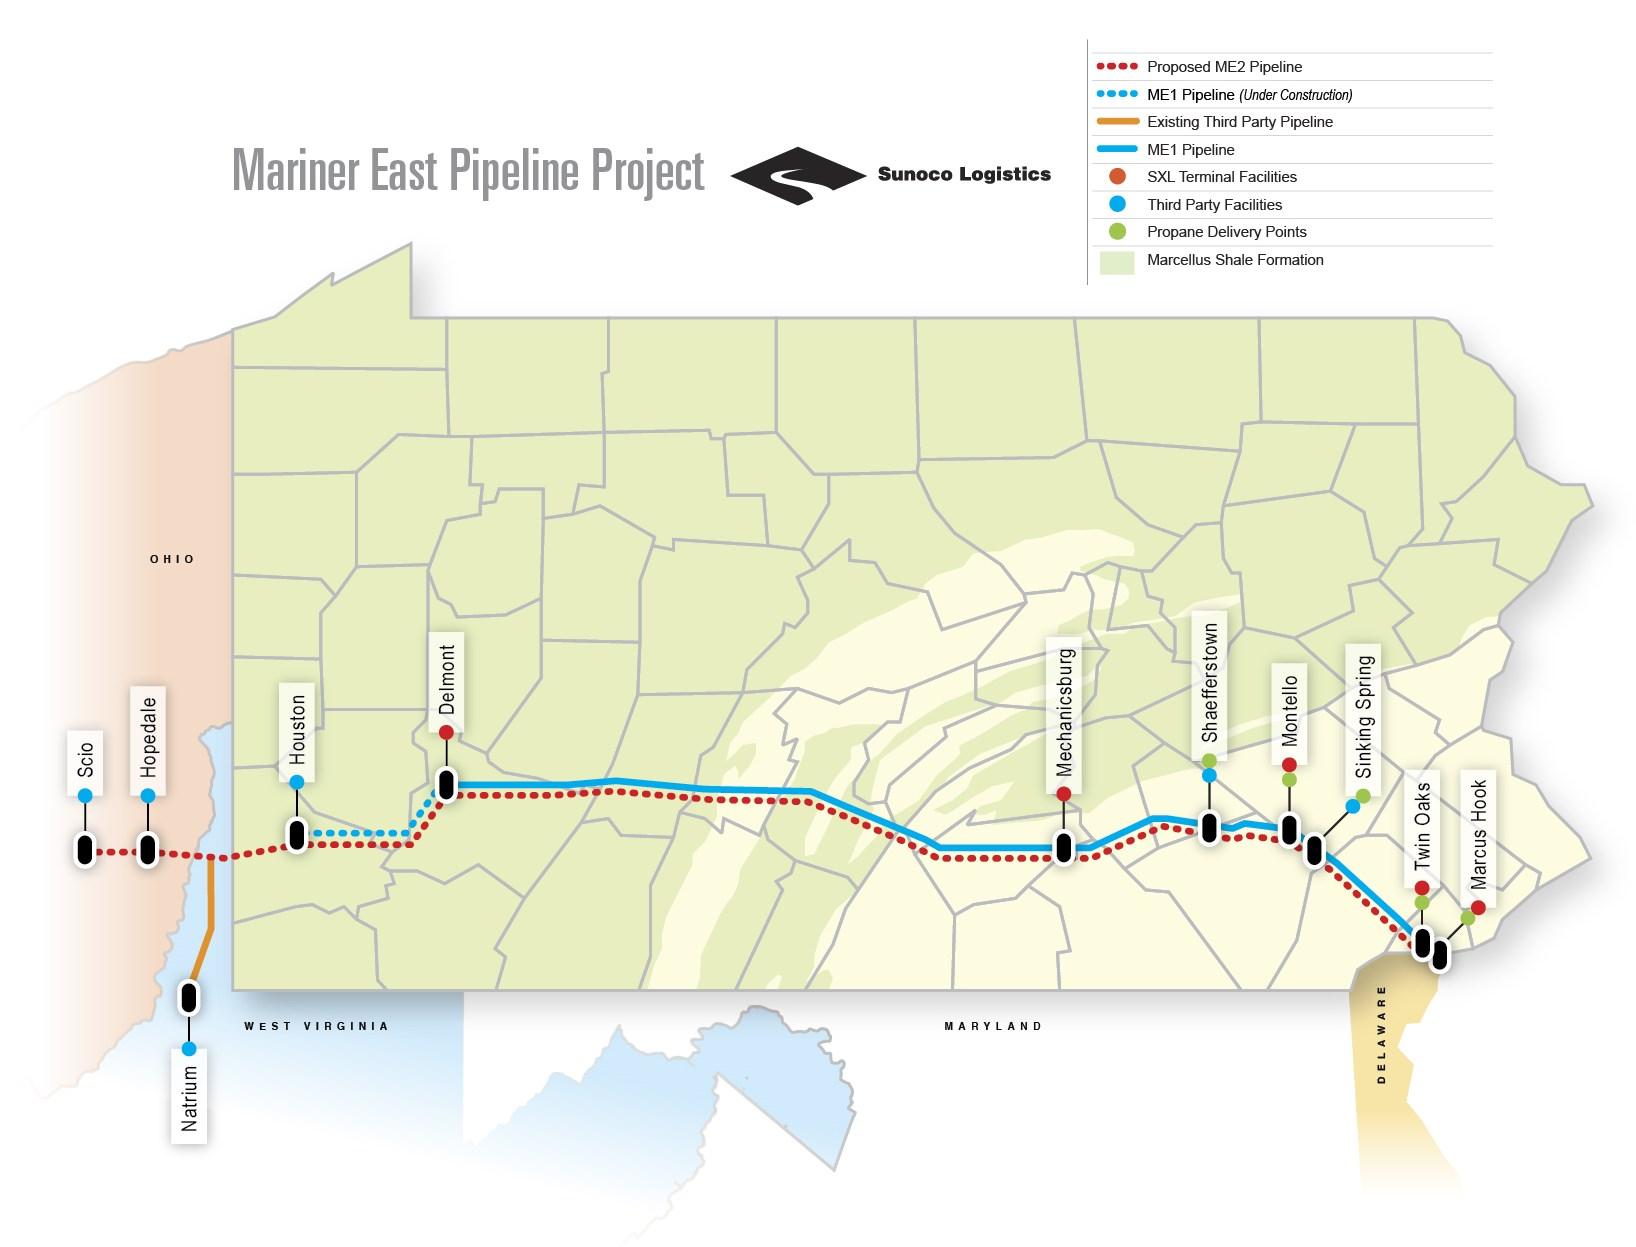 Sunoco To Go Ahead With 2 5 Billion Pipeline Through